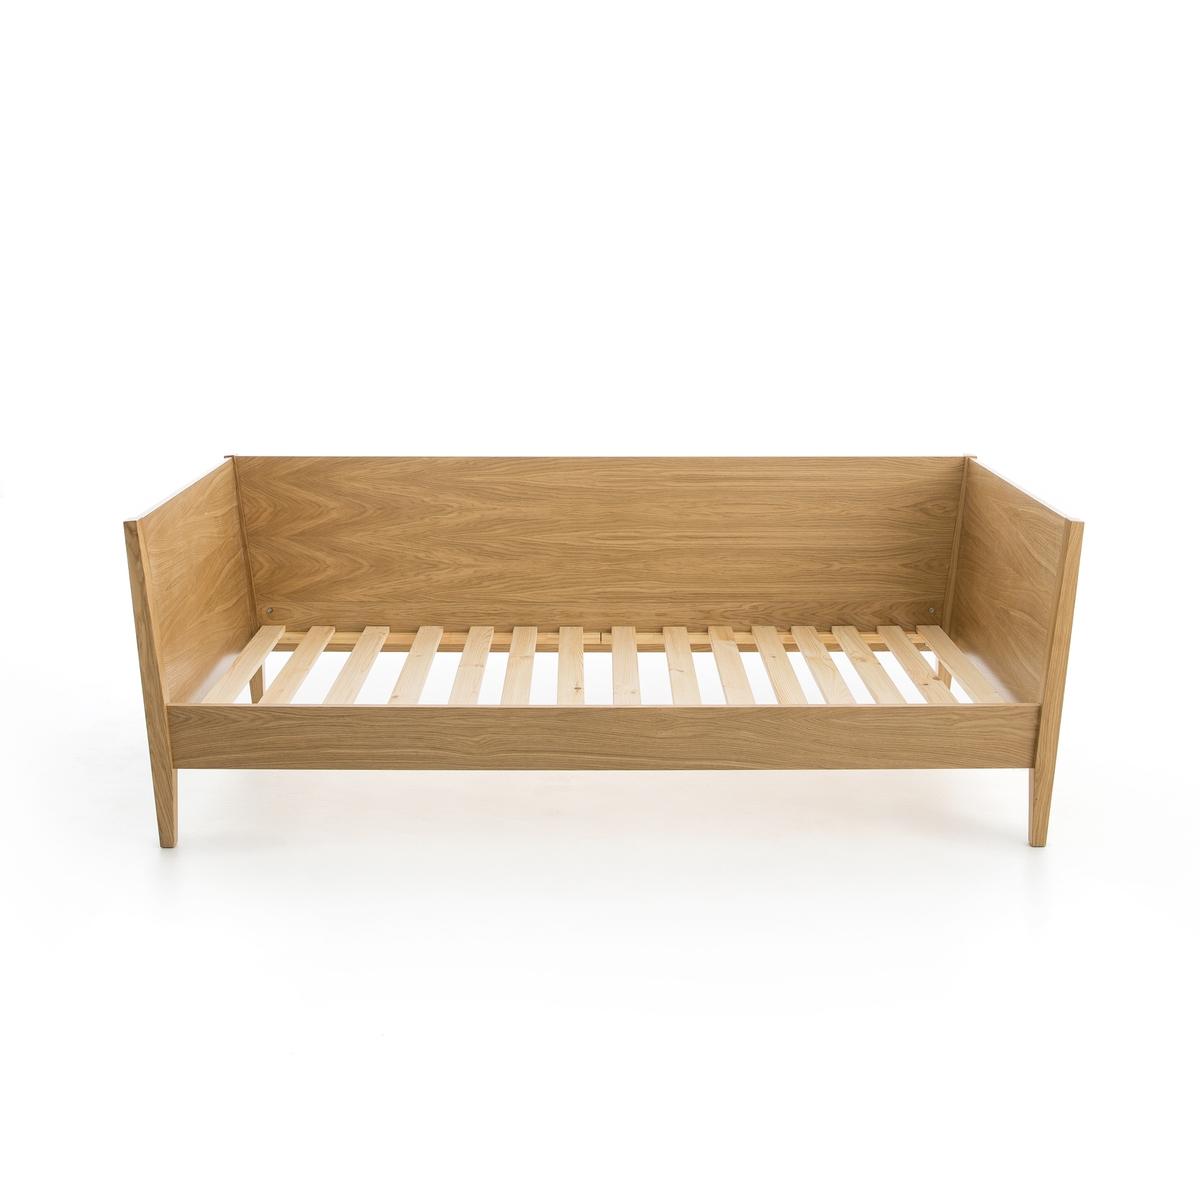 Диван-кровать LaRedoute Castou 90 x 190 см бежевый